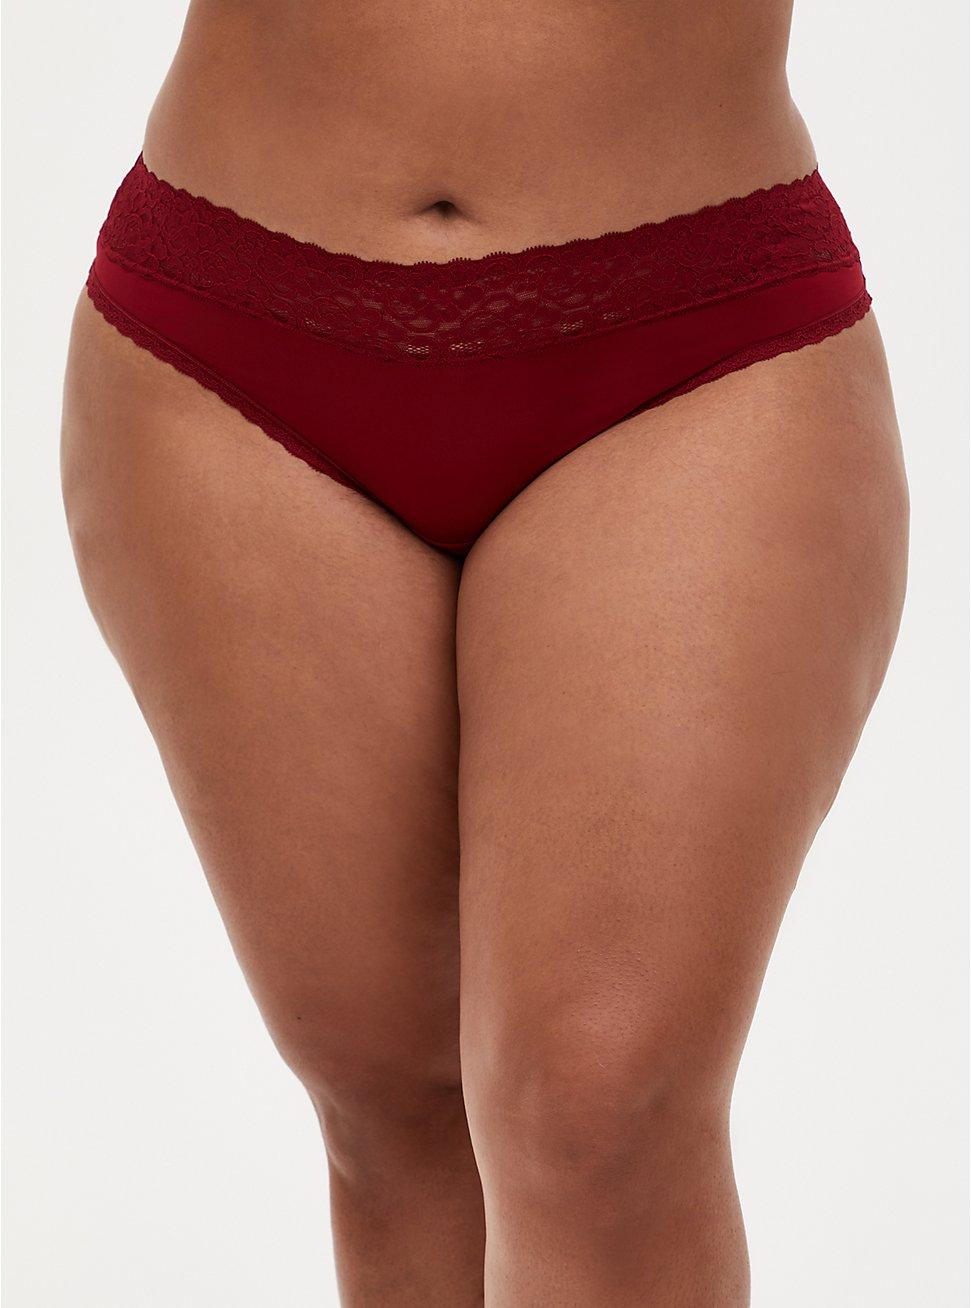 Dark Red Second Skin Wide Lace Thong Panty, BIKING RED, hi-res